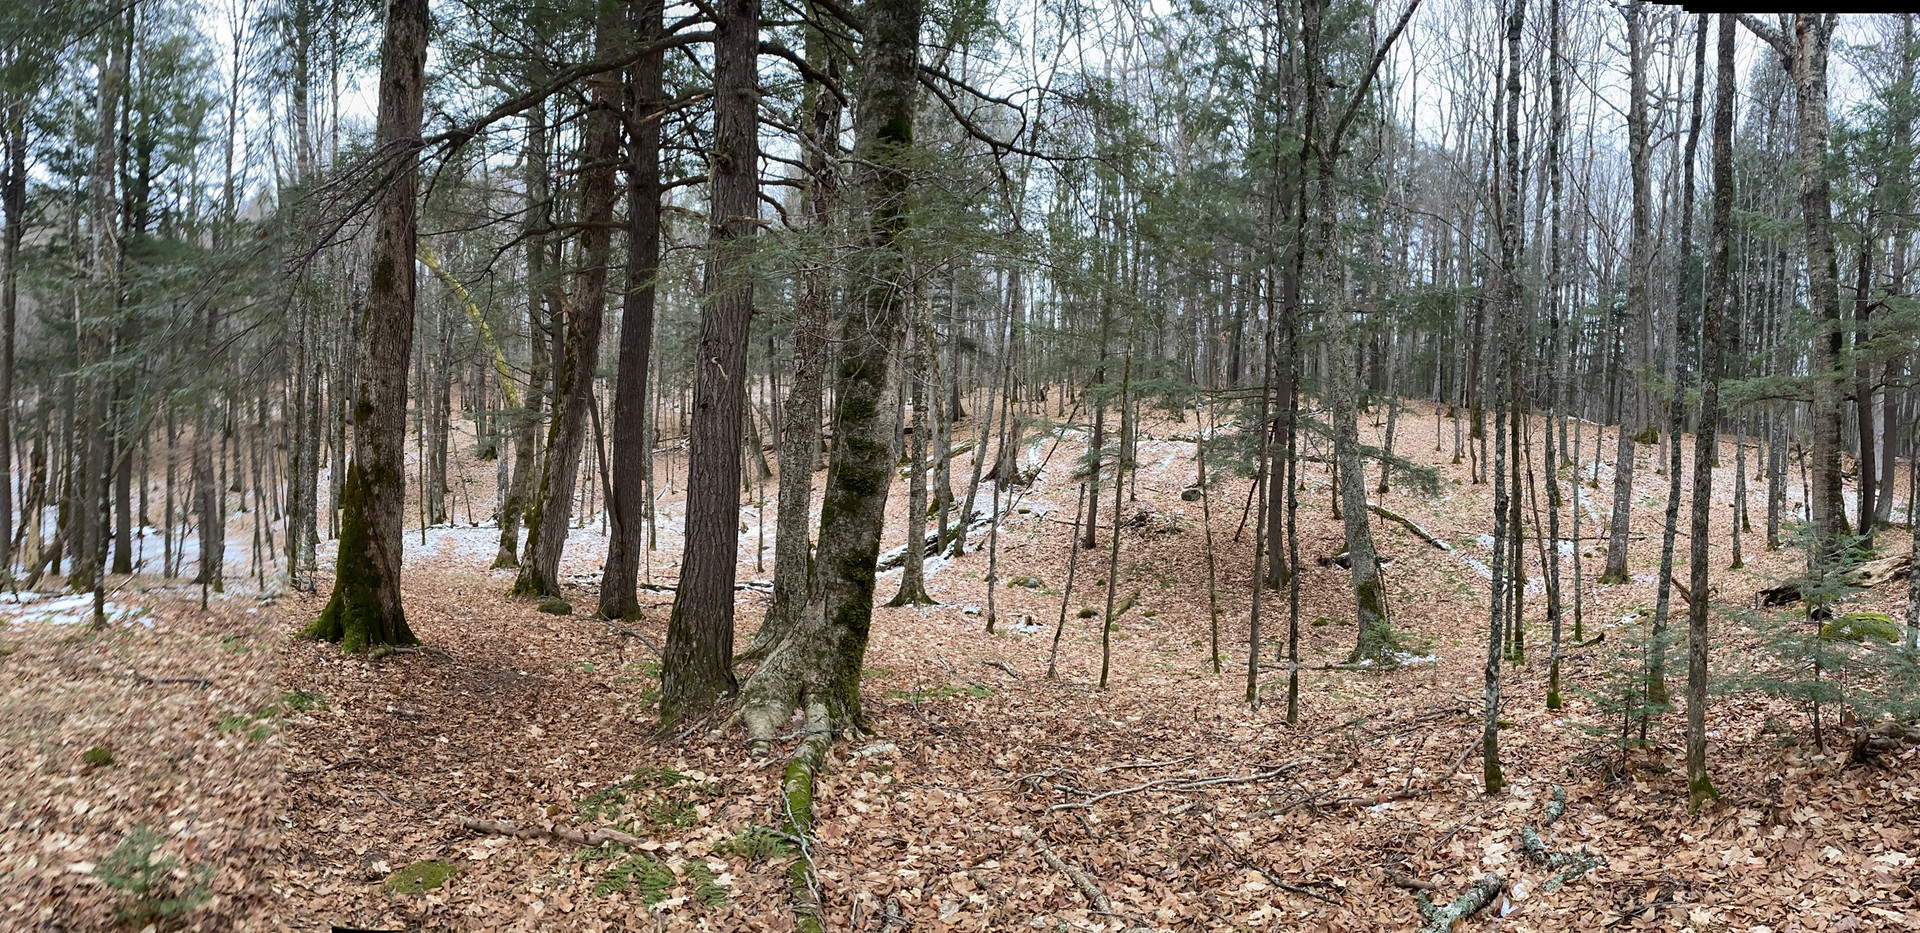 drummond woods3.jpg